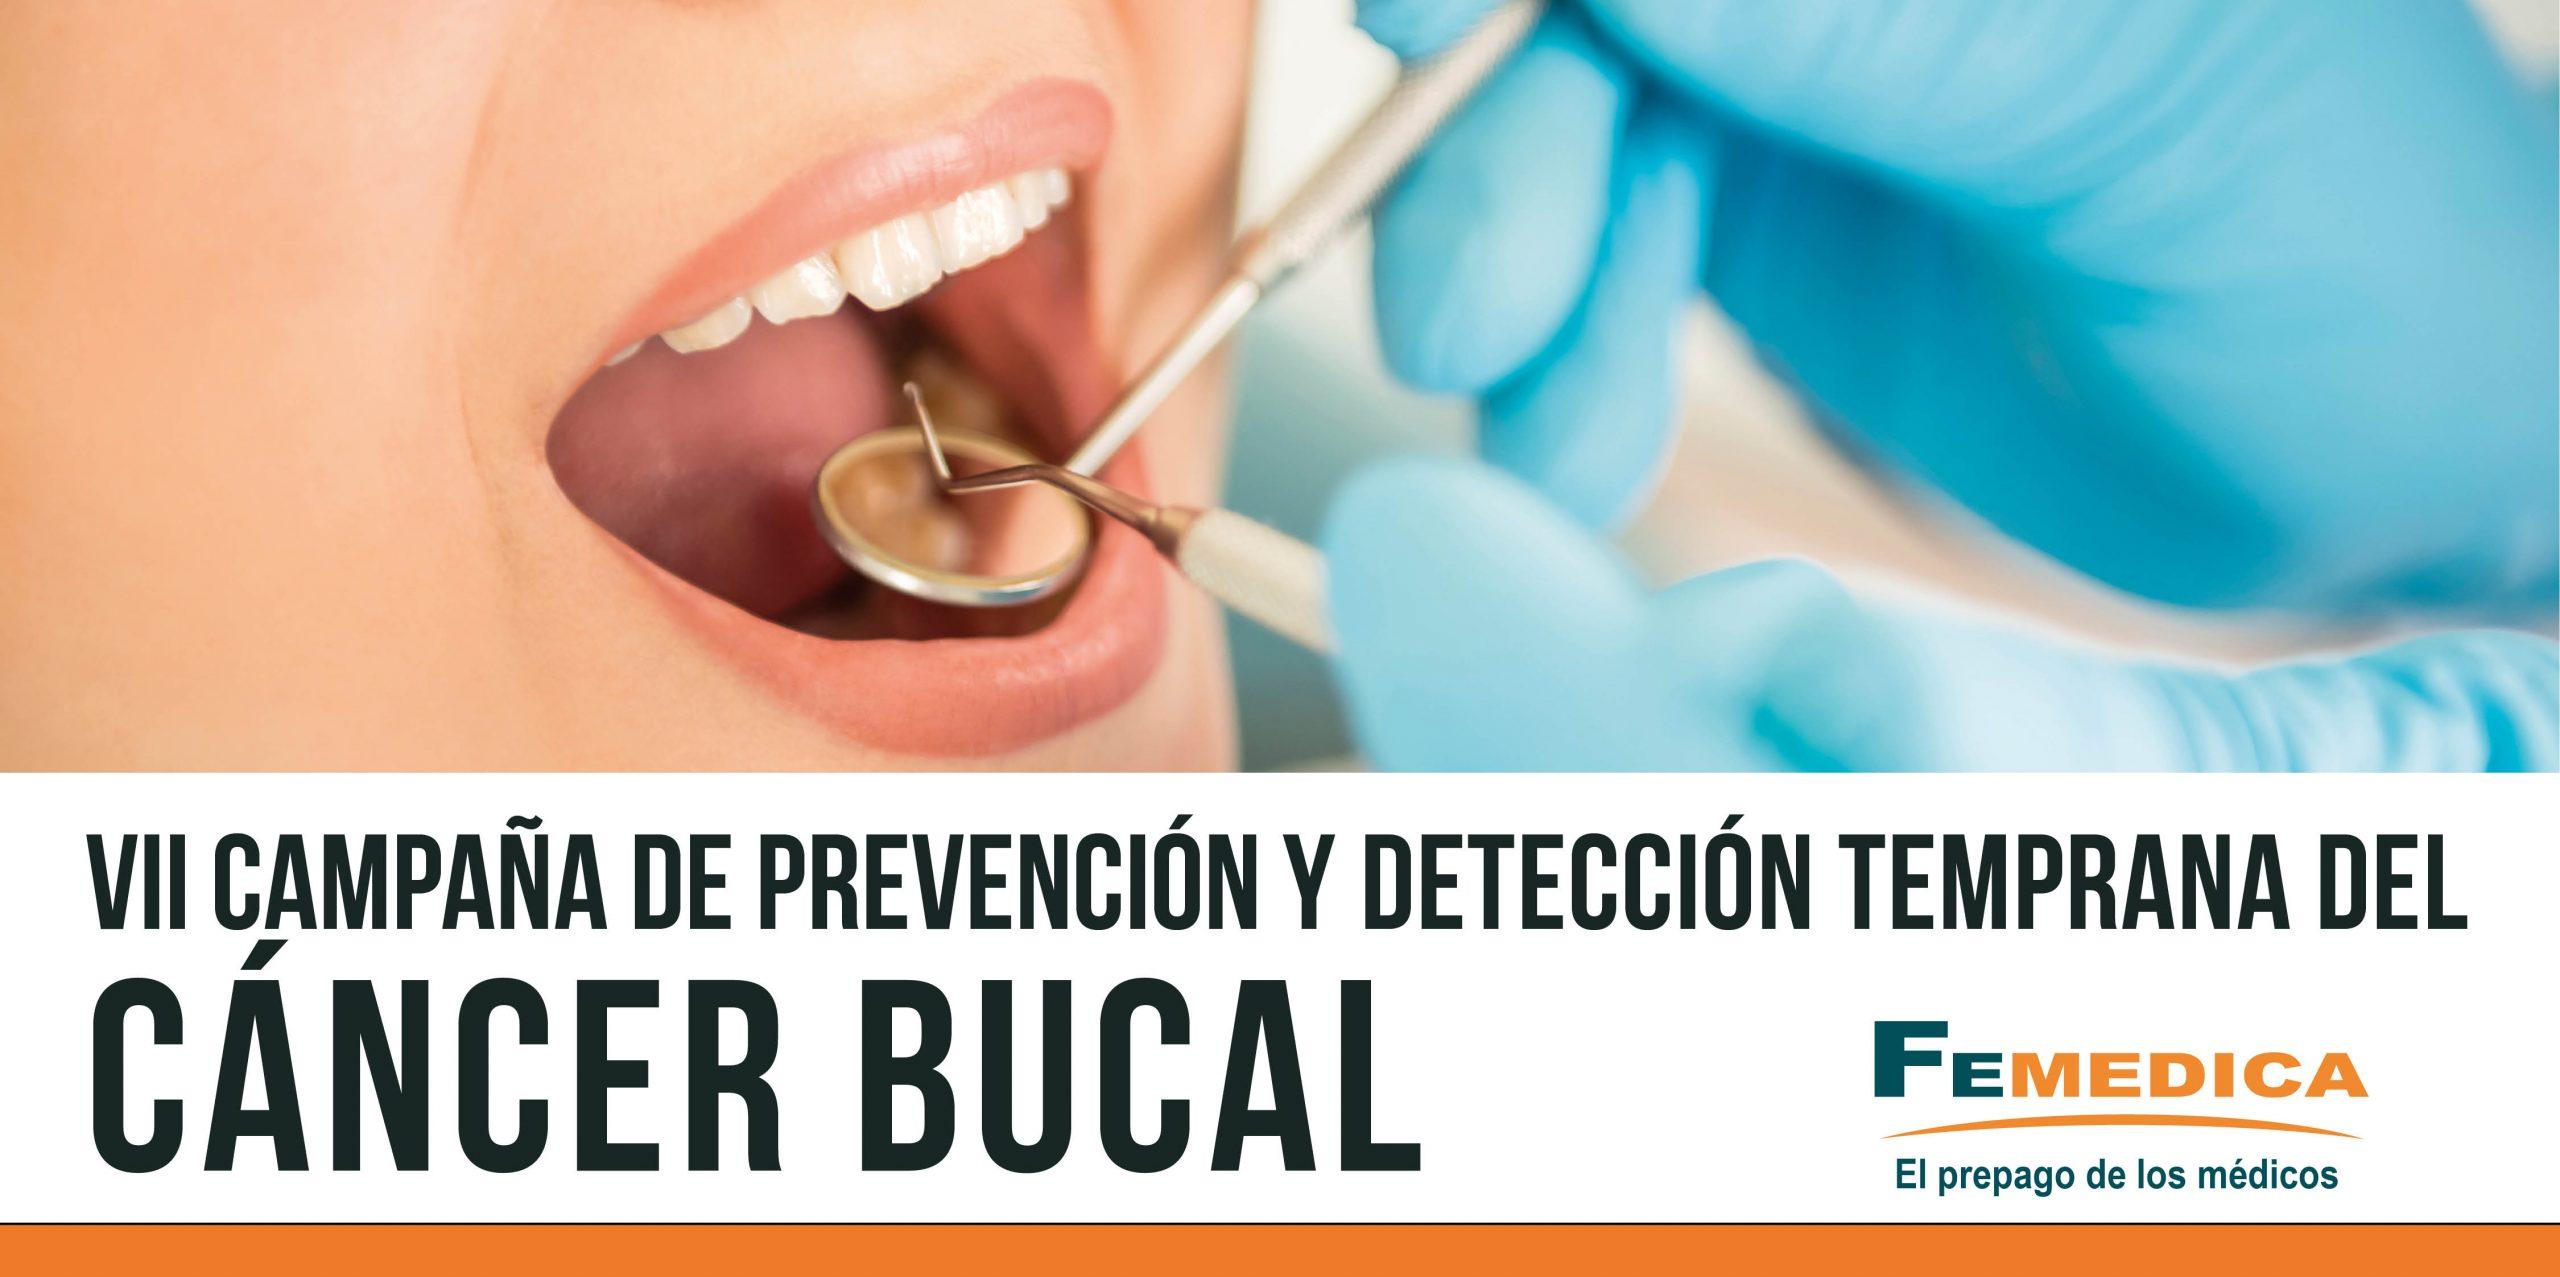 Cancer bucal campana, Cancer bucal prevencion